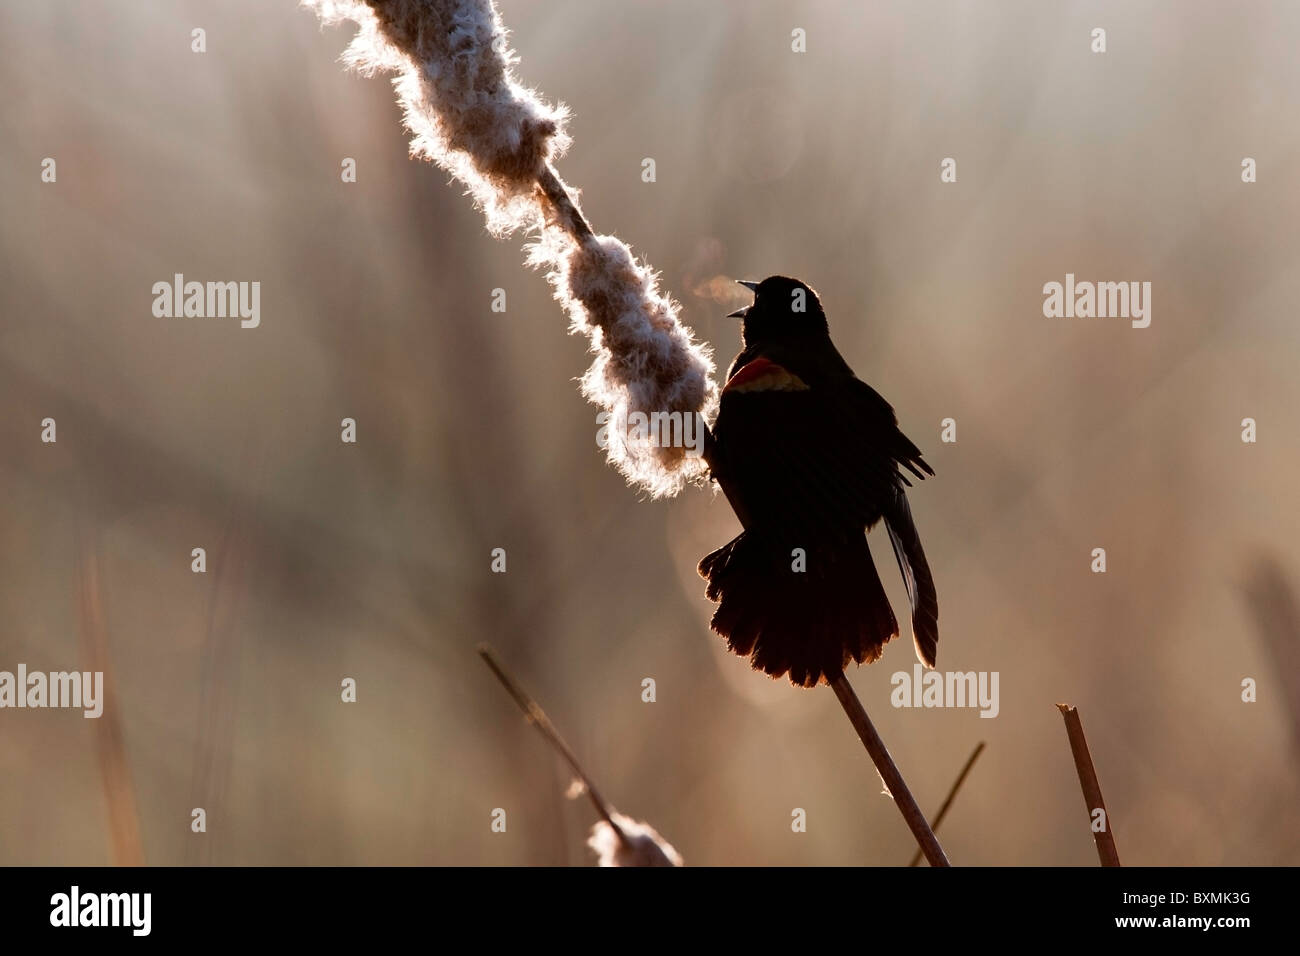 Rotschulterstärling singen an einem kalten Morgen Stockbild